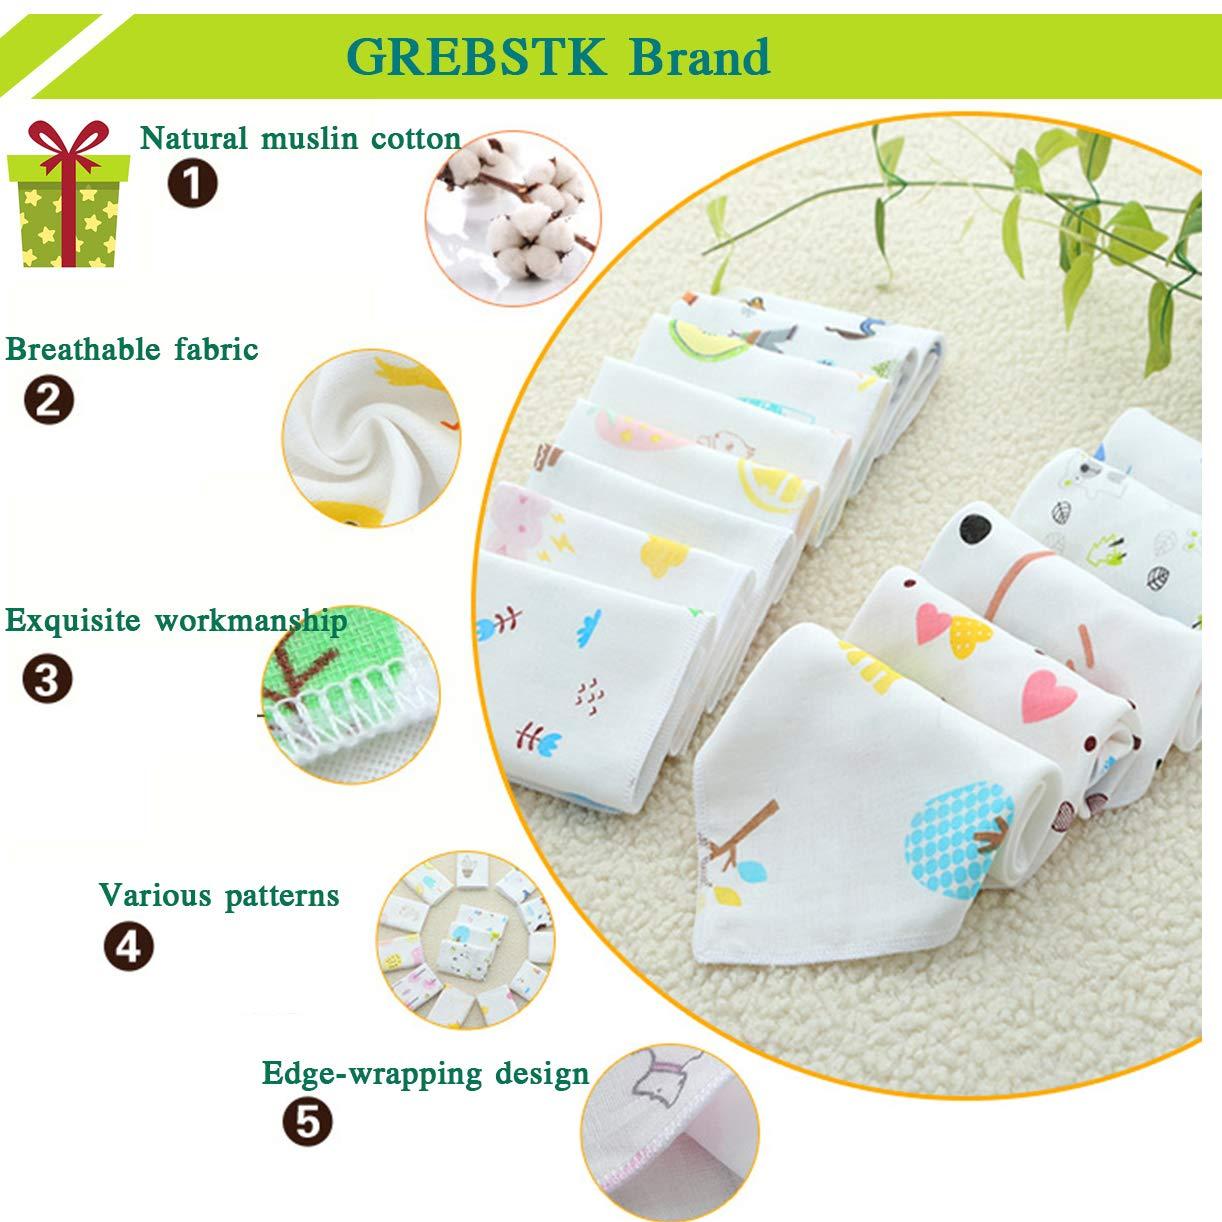 GREBSTK 10 PCS Baby Washcloths 4 Layers Natural Muslin Cotton 10x10 Inches Newborn Baby Face Towel